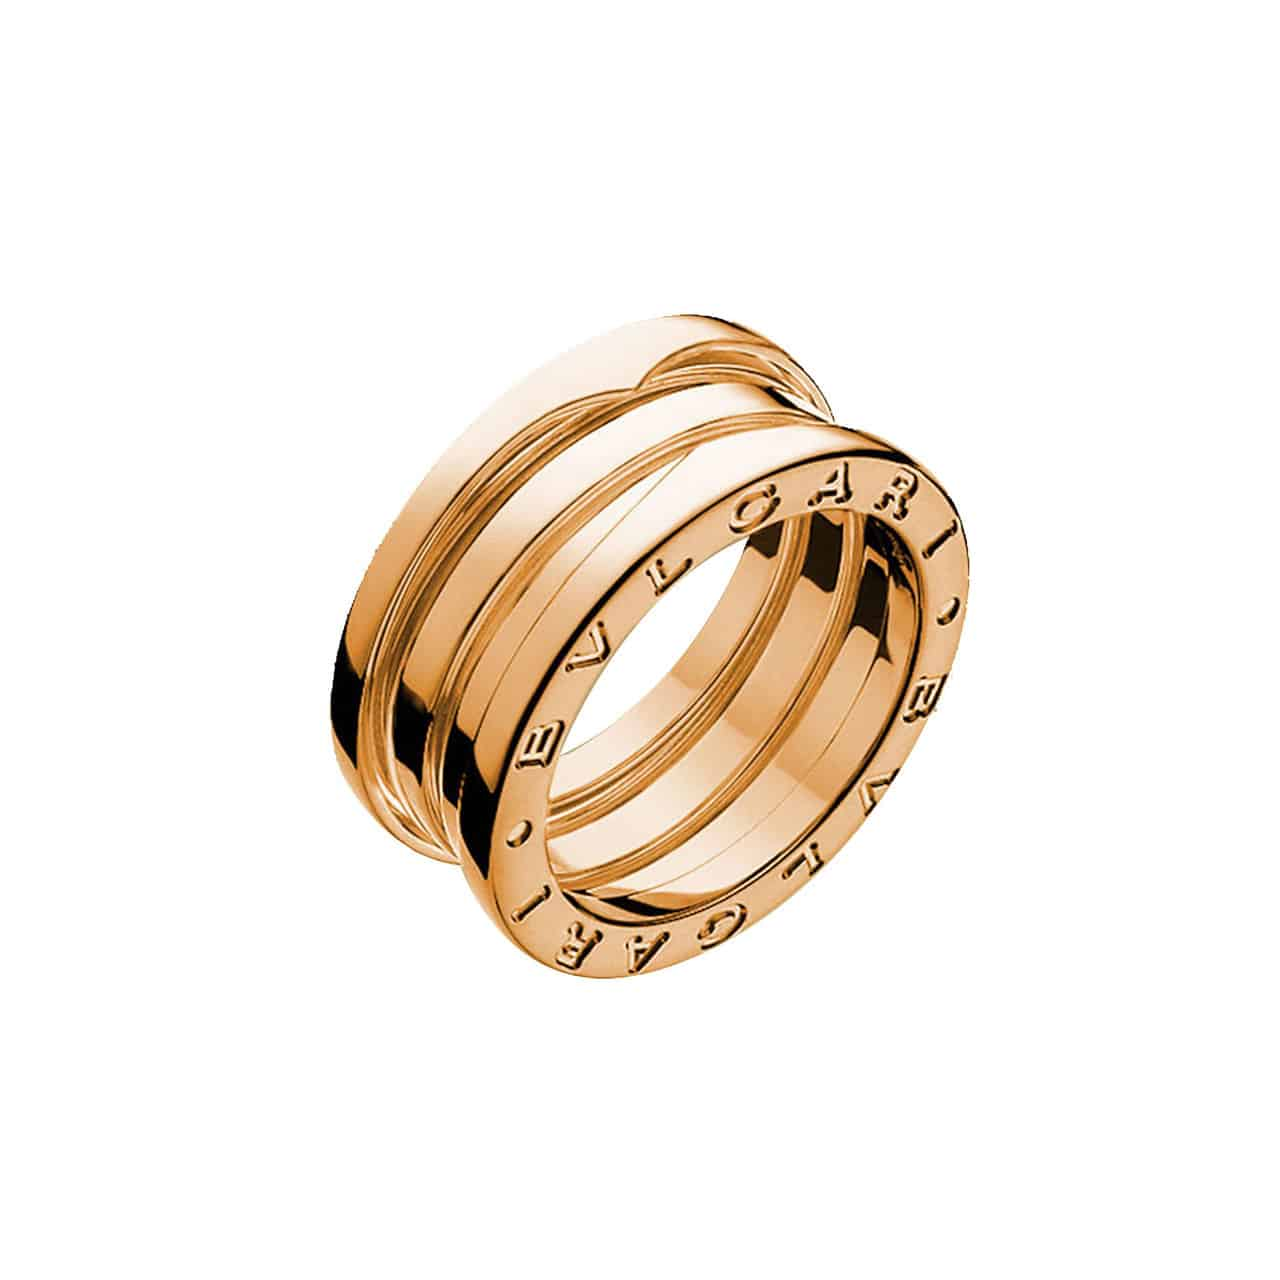 e1ed66593aba9 B.zero1 3 Band Rose Gold Ring (AN852405)